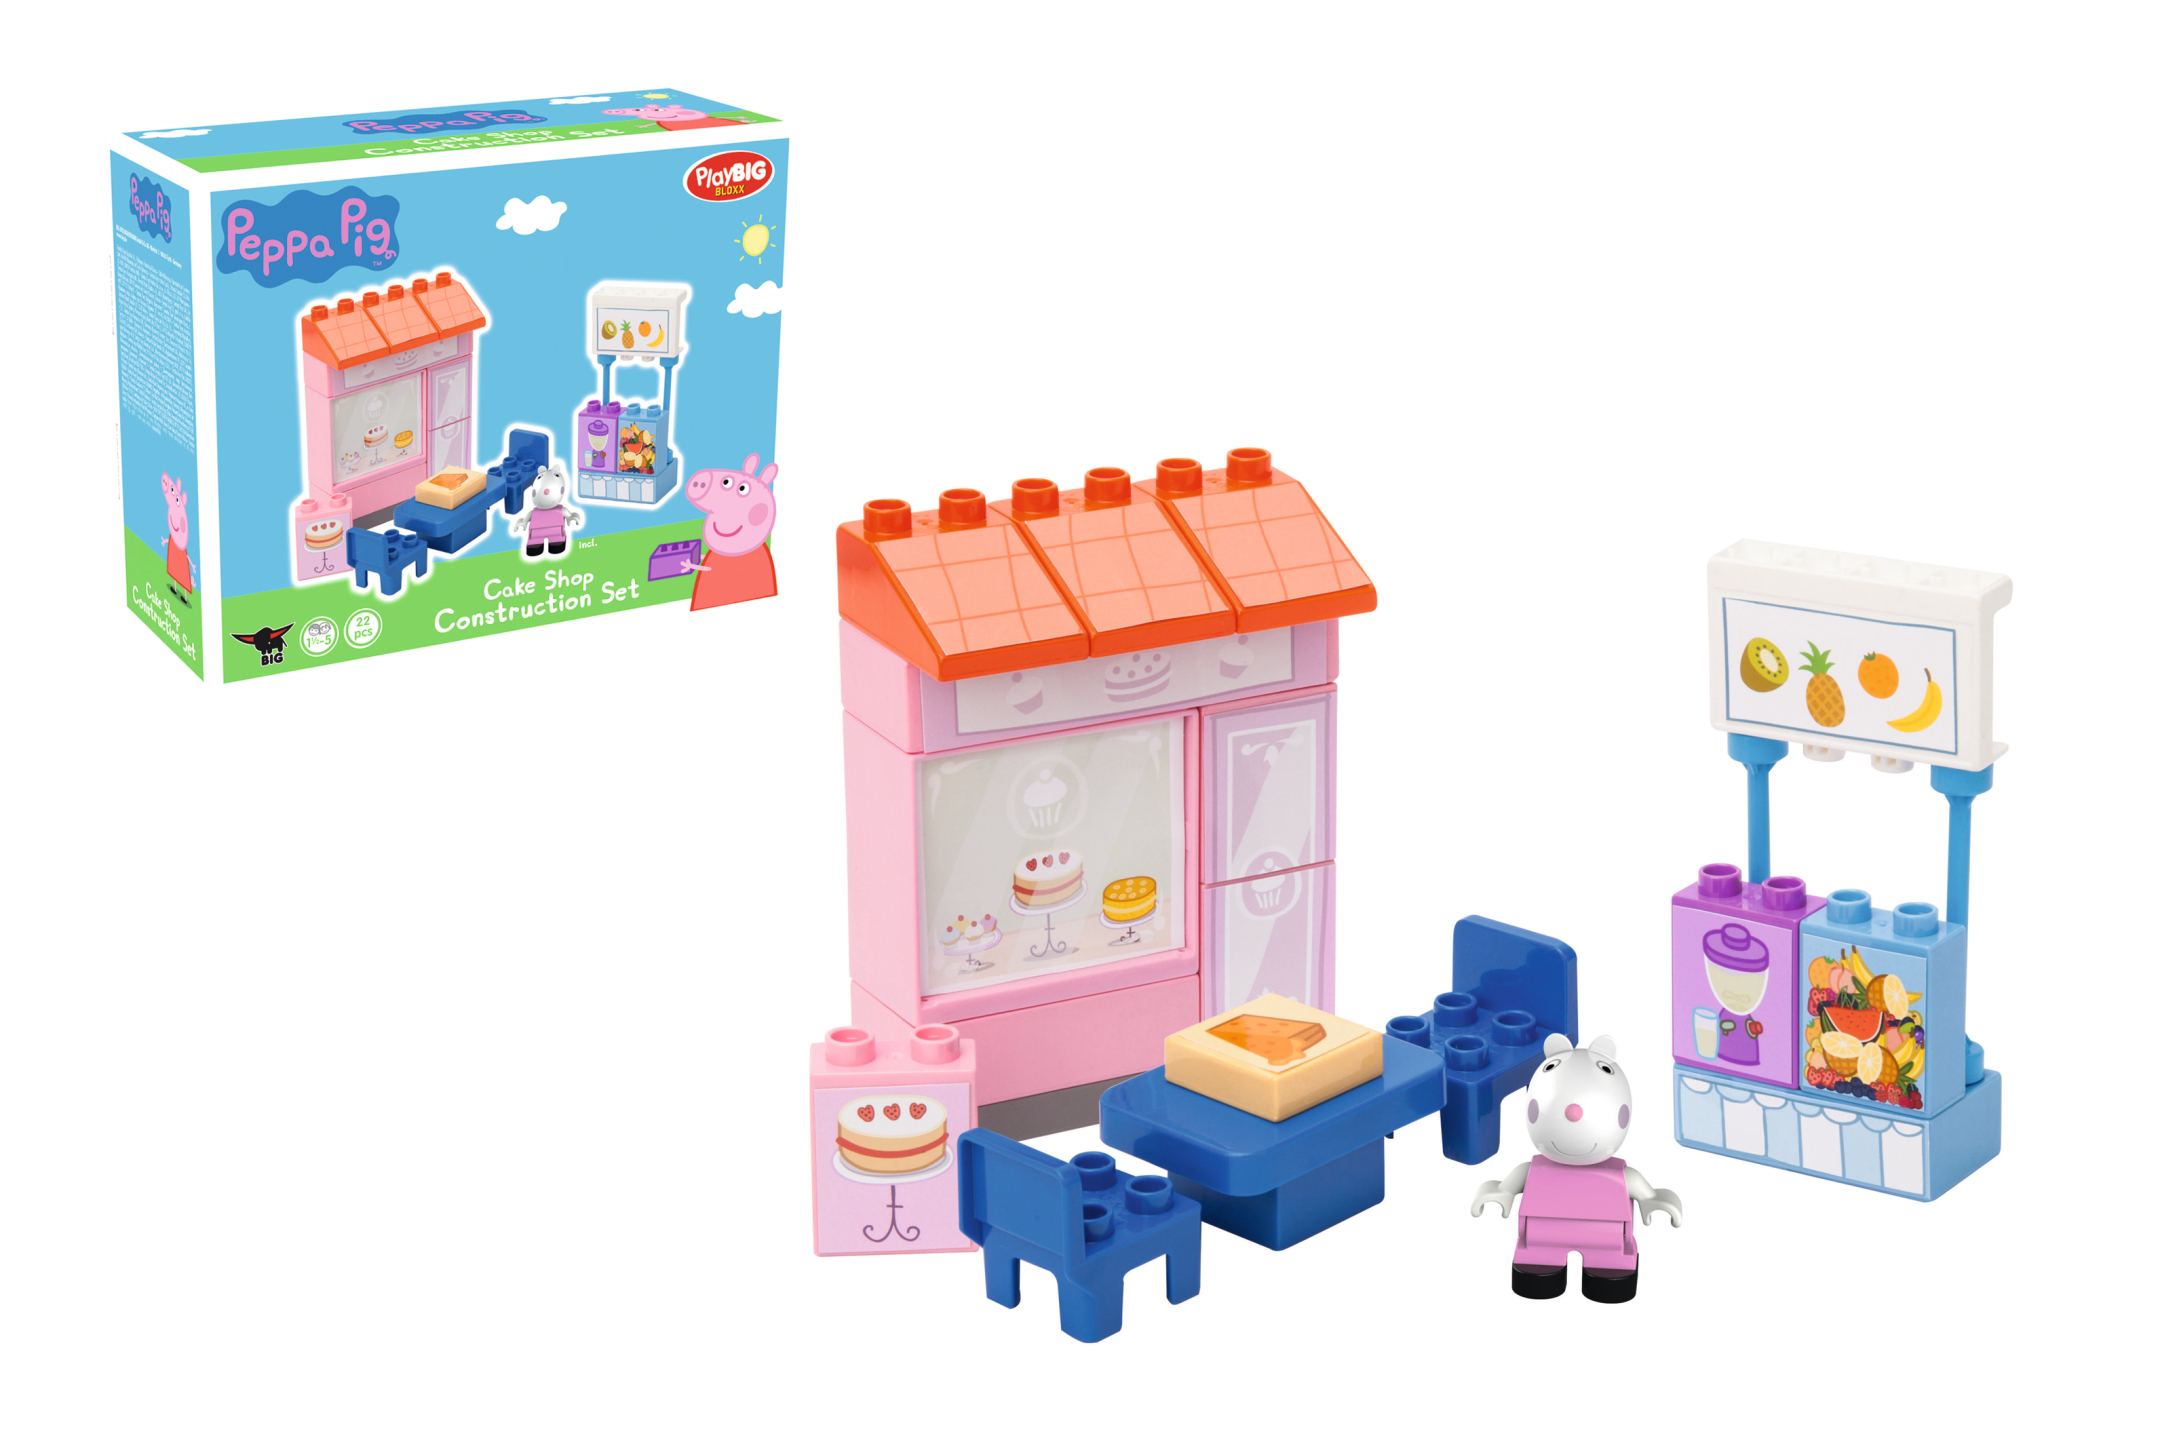 playbig bloxx peppa pig - cake shop